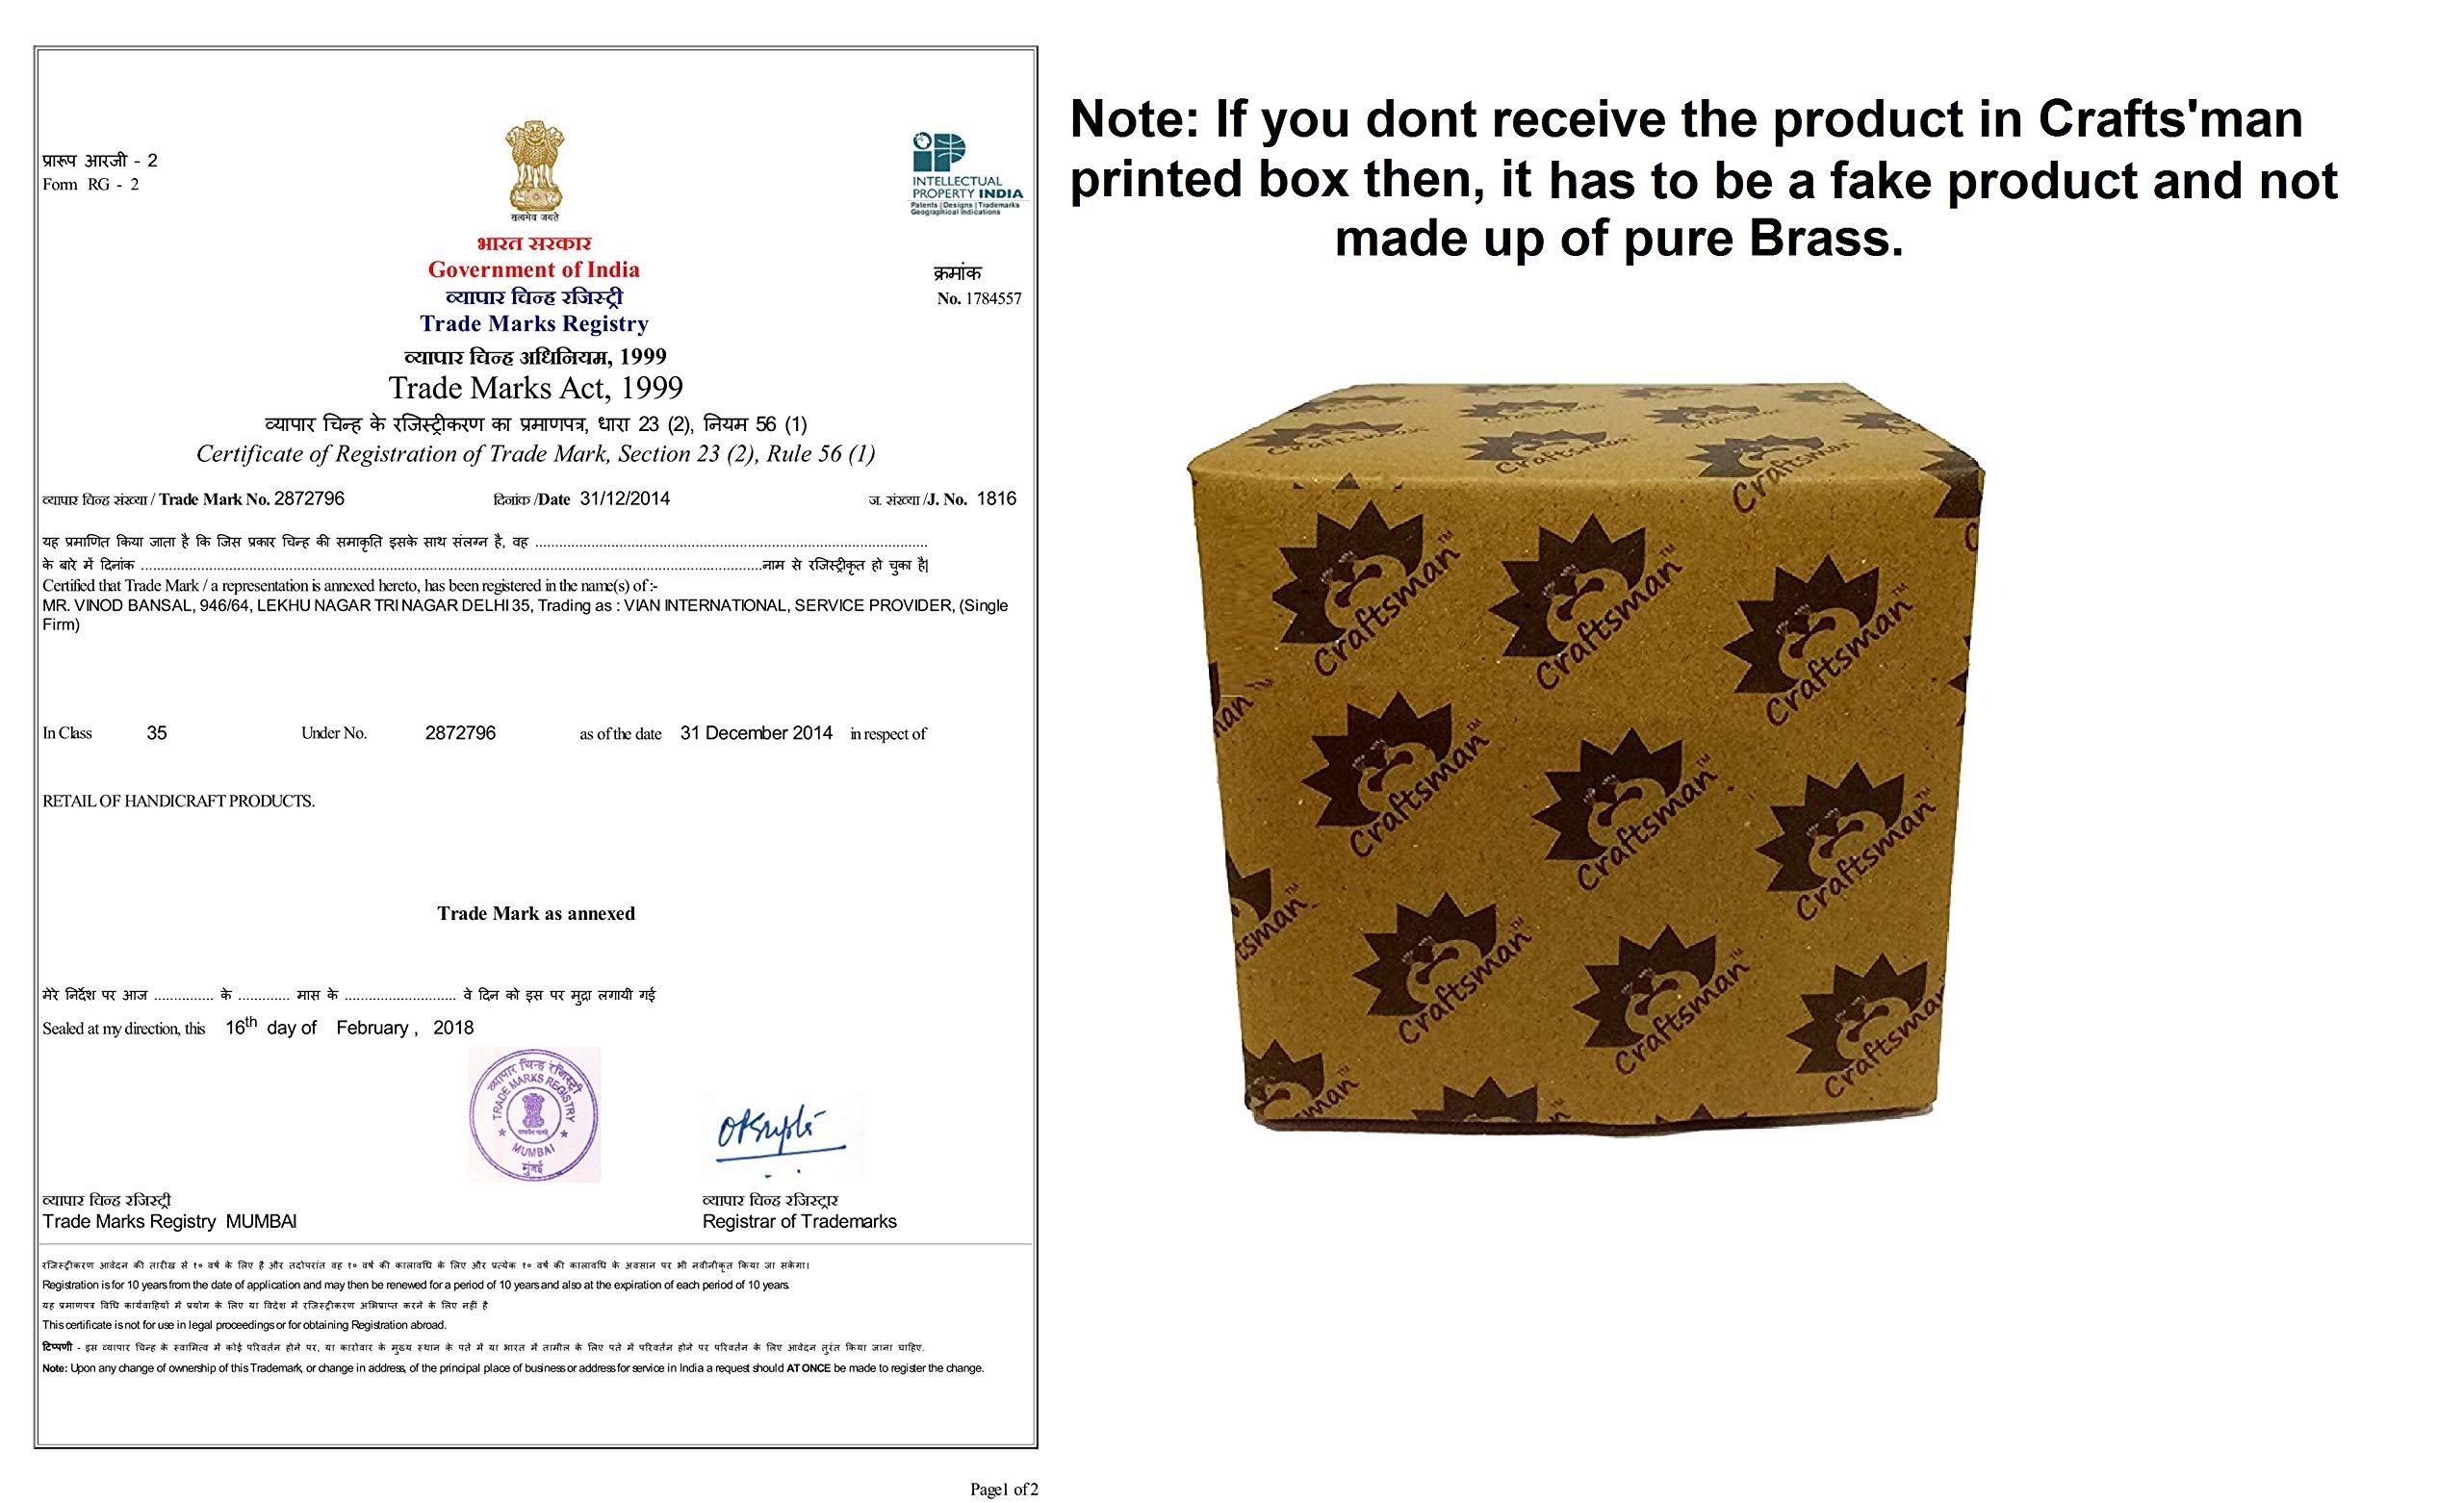 KUBER Diya. Pure Virgin Brass Diwali Puja Diya Set of 10 Piece Indian Pooja Oil Lamp Dia. 2.5 Inch Deepawali Diya/Oil Lamp/CandleTea Light Holder/Diwali Decoration/Christmas Decoration